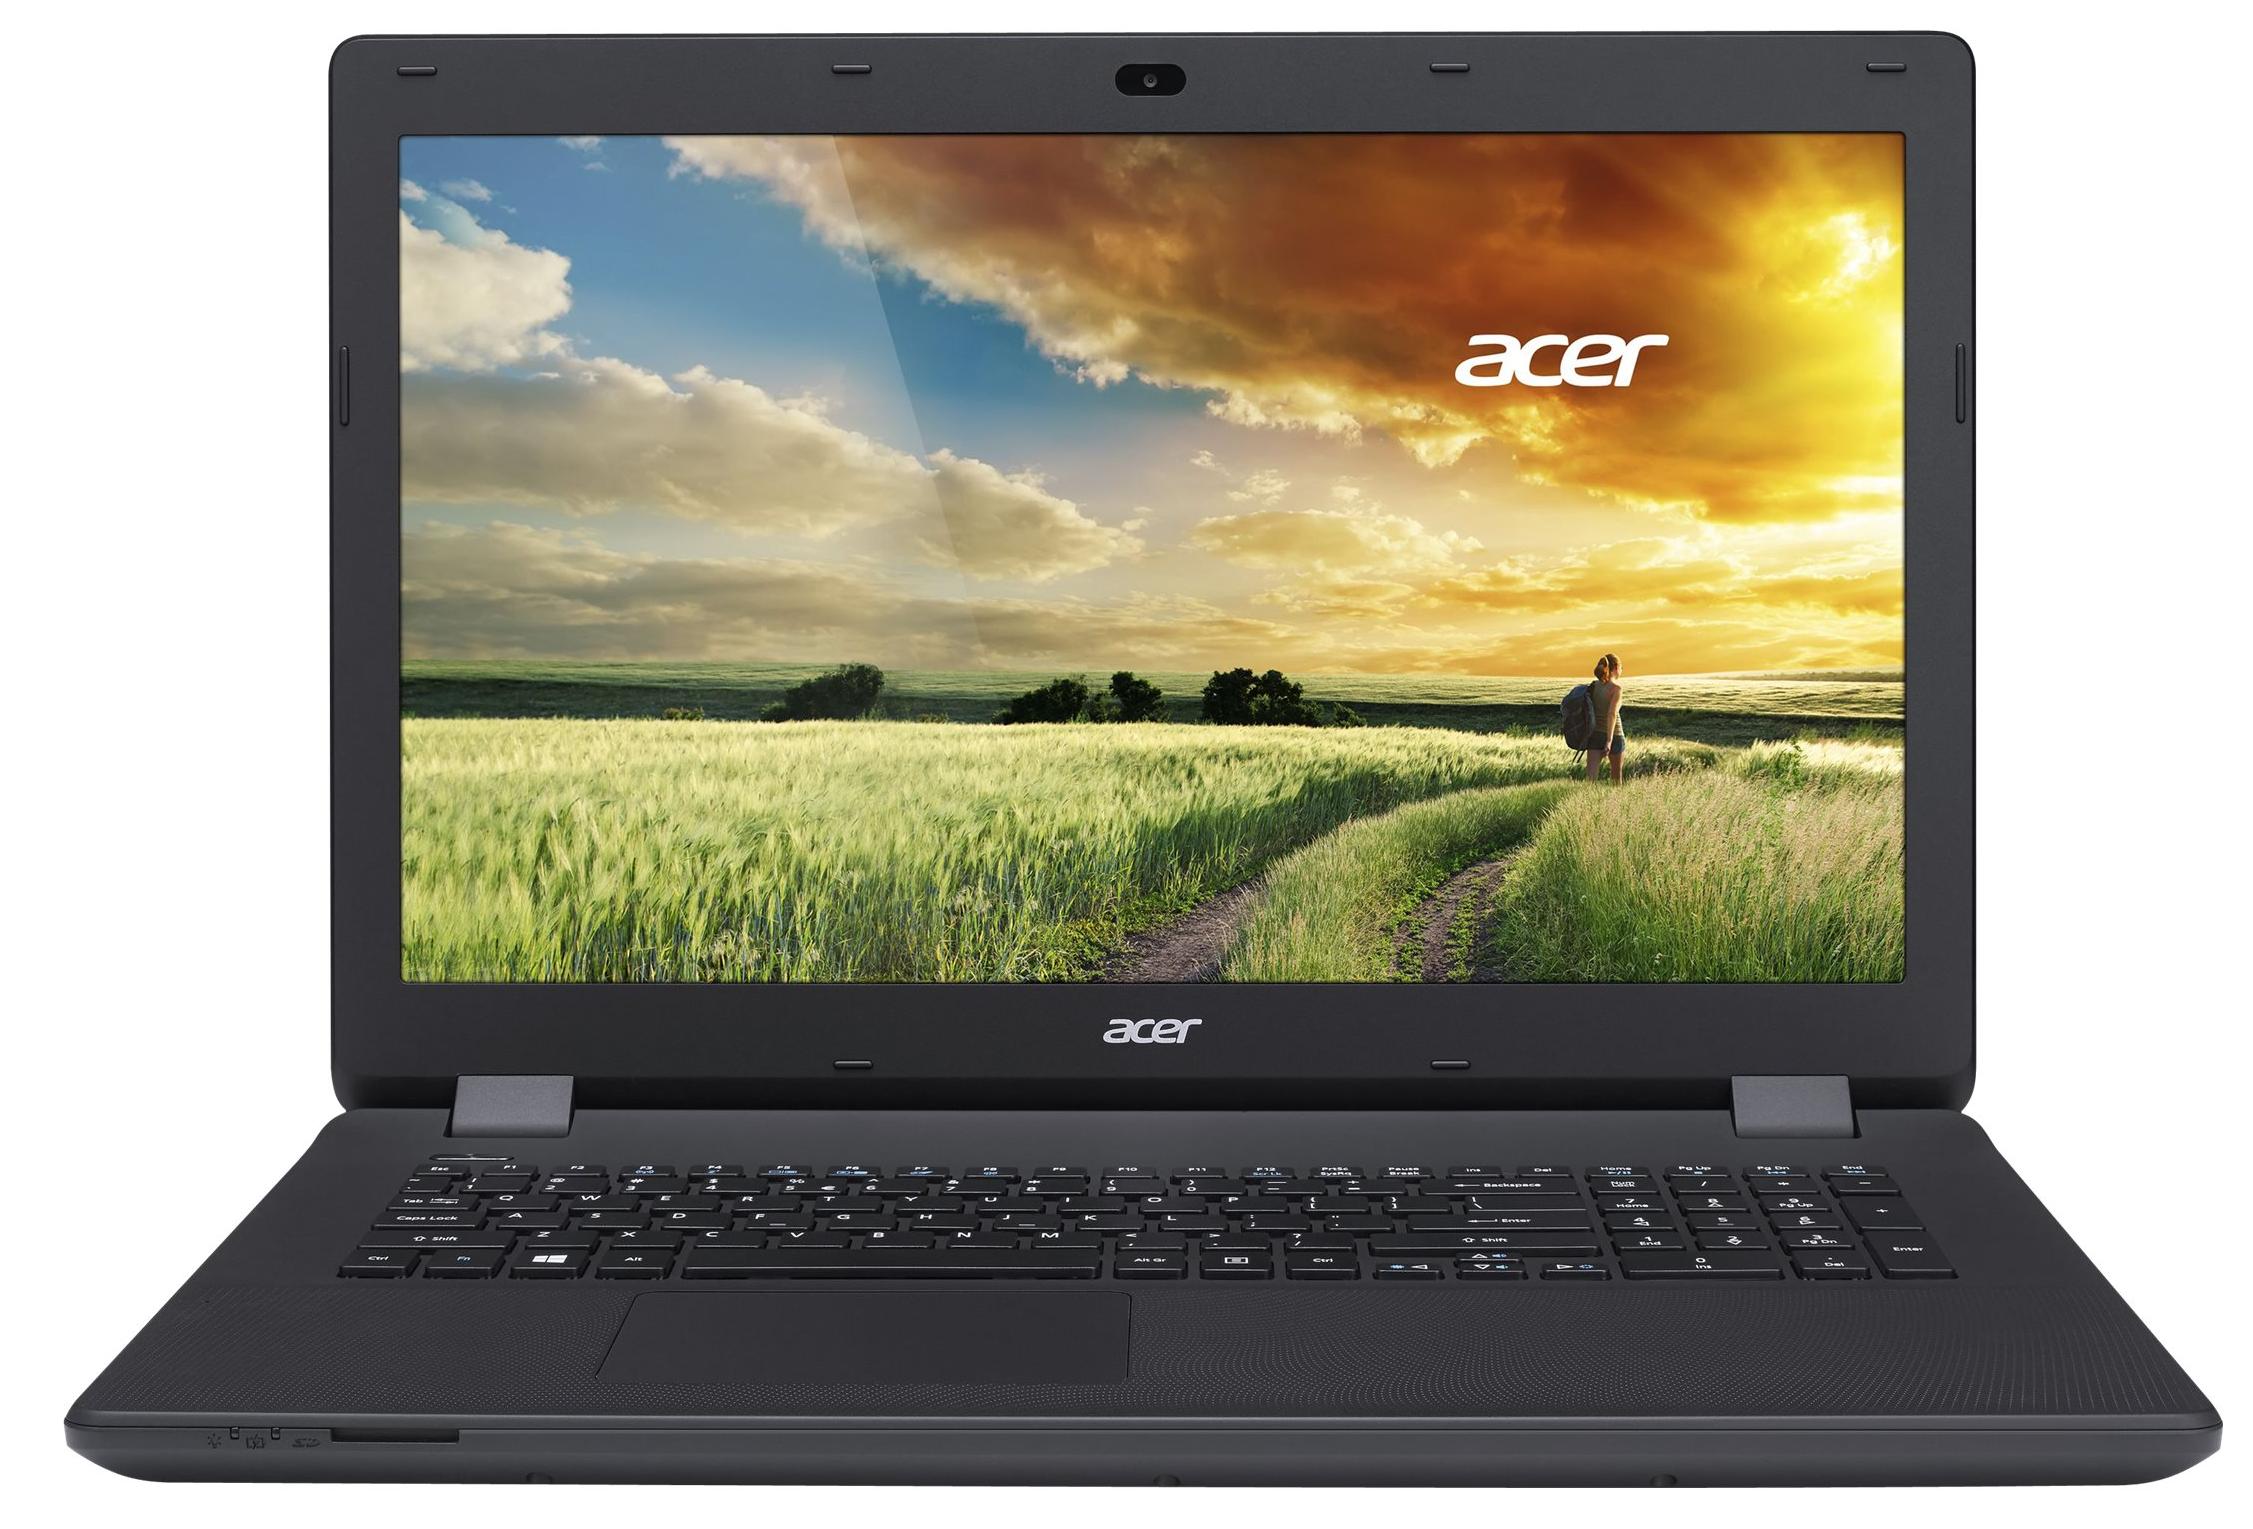 Acer ES1-711